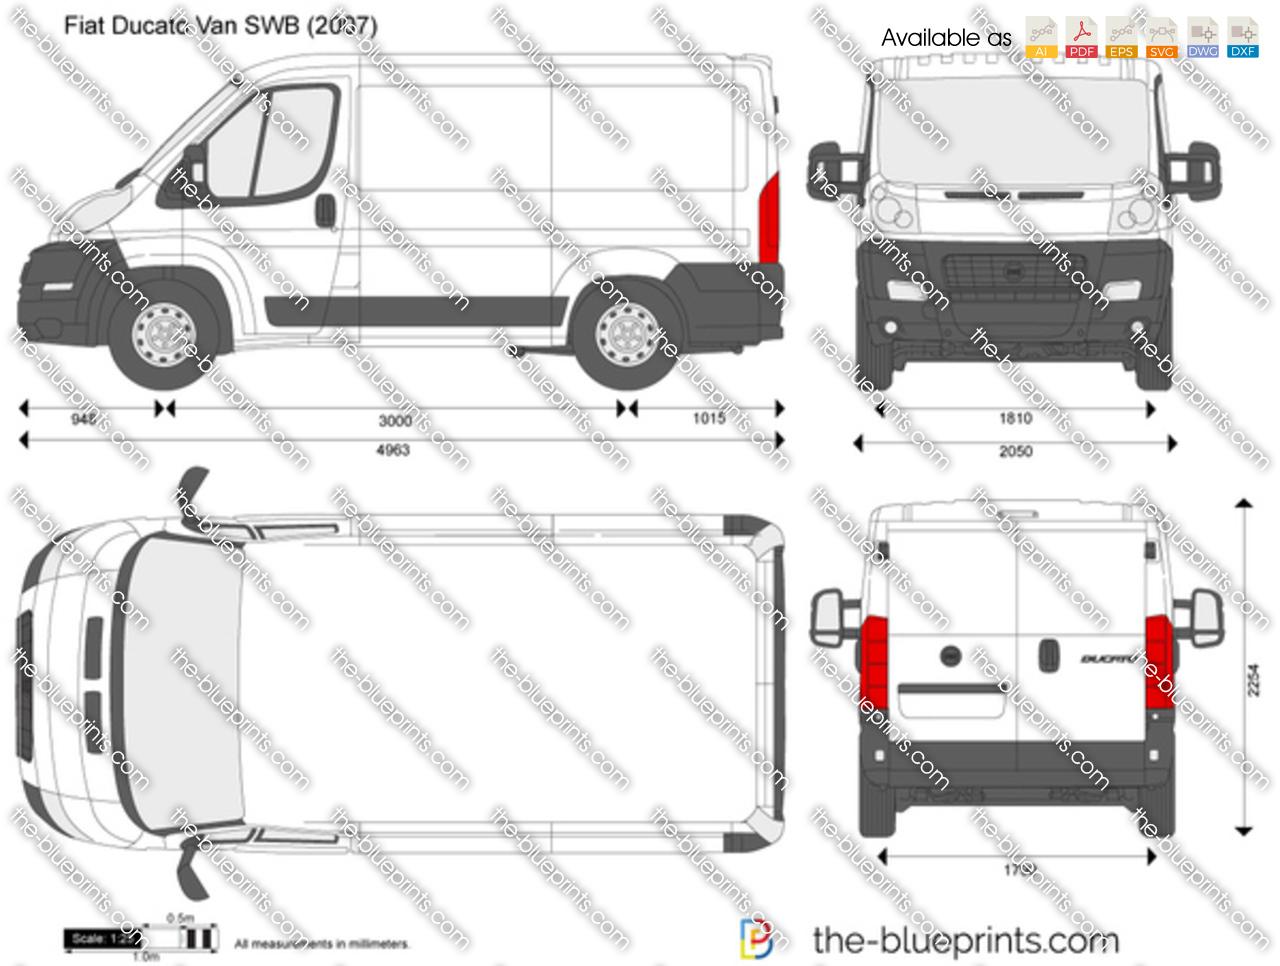 Fiat Ducato Van SWB vector drawing